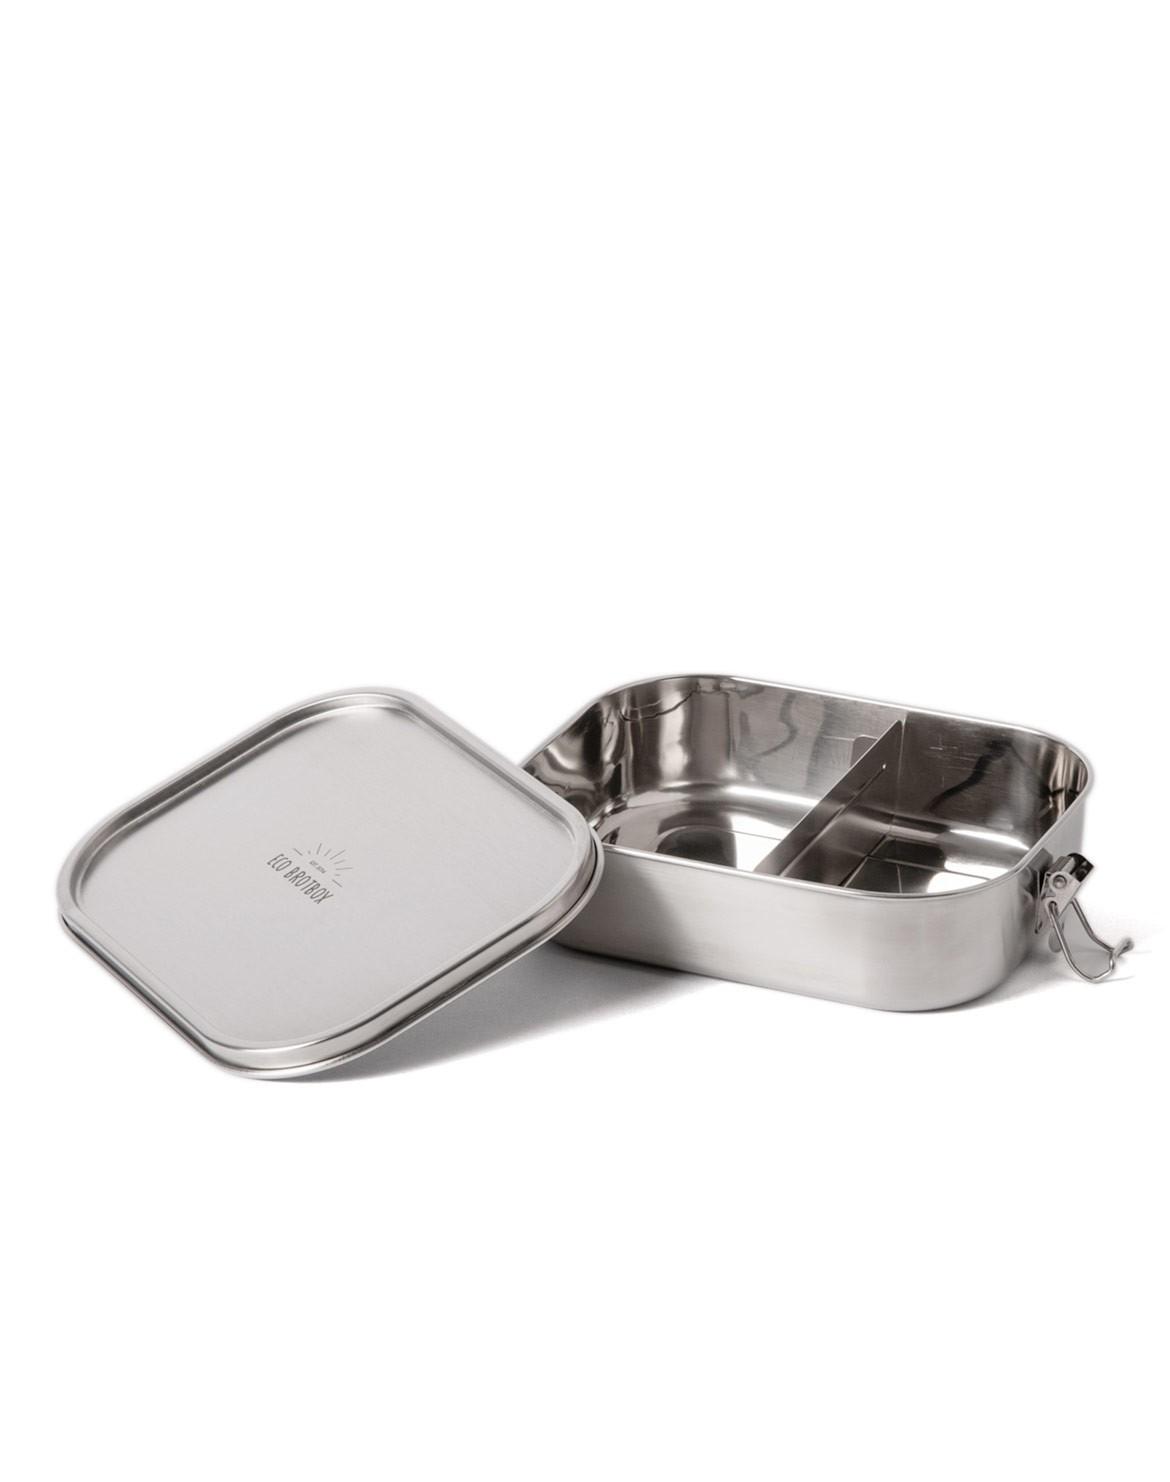 Bento Flex+ Lunchbox